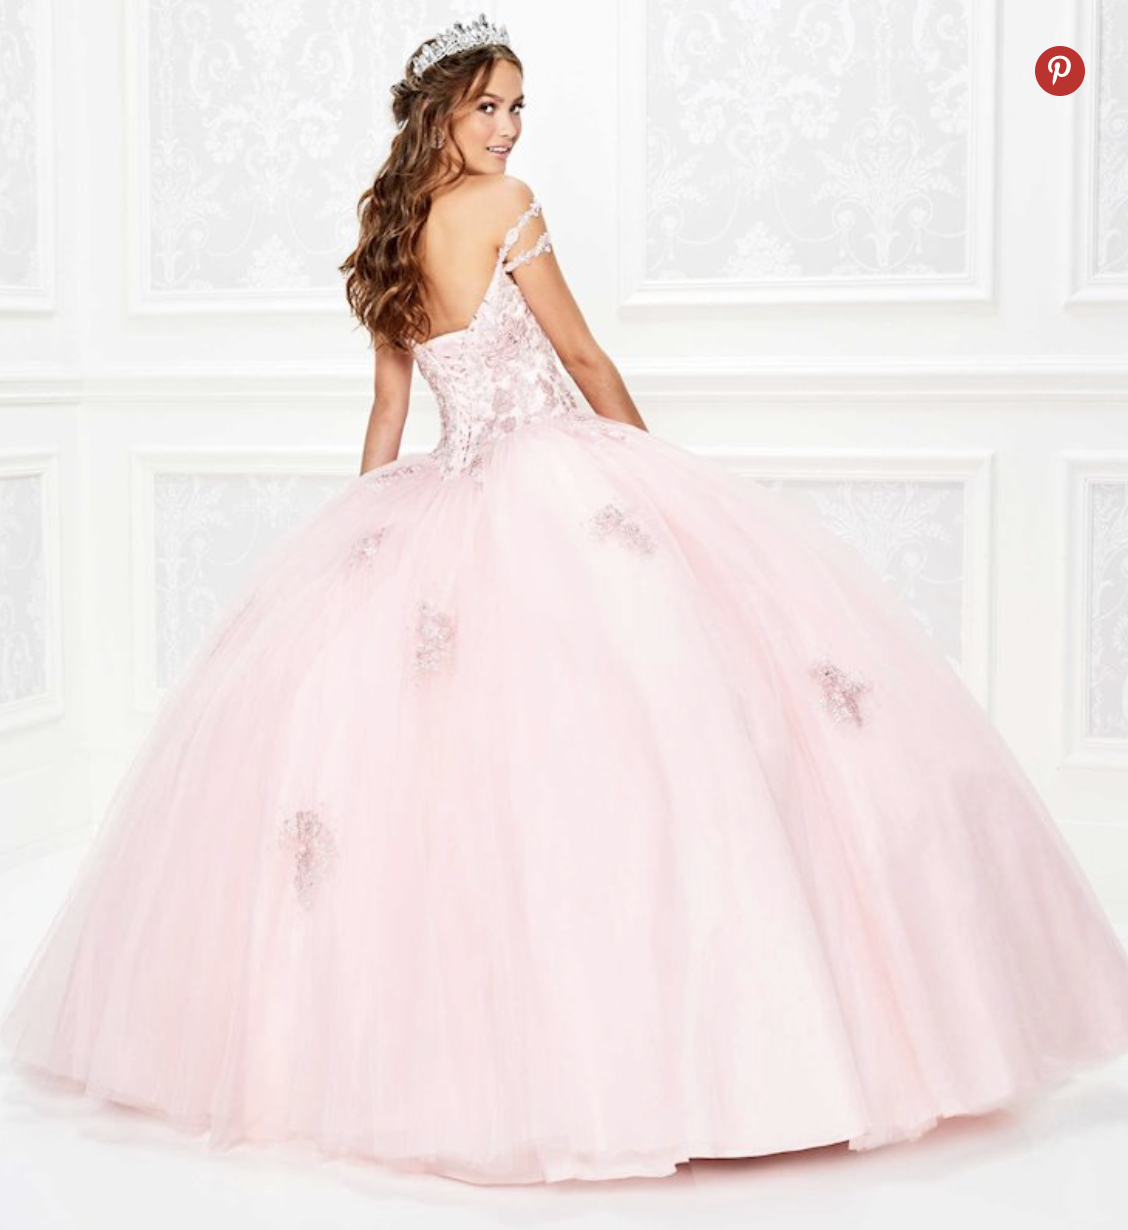 Princesa By Ariana Vara PR11939